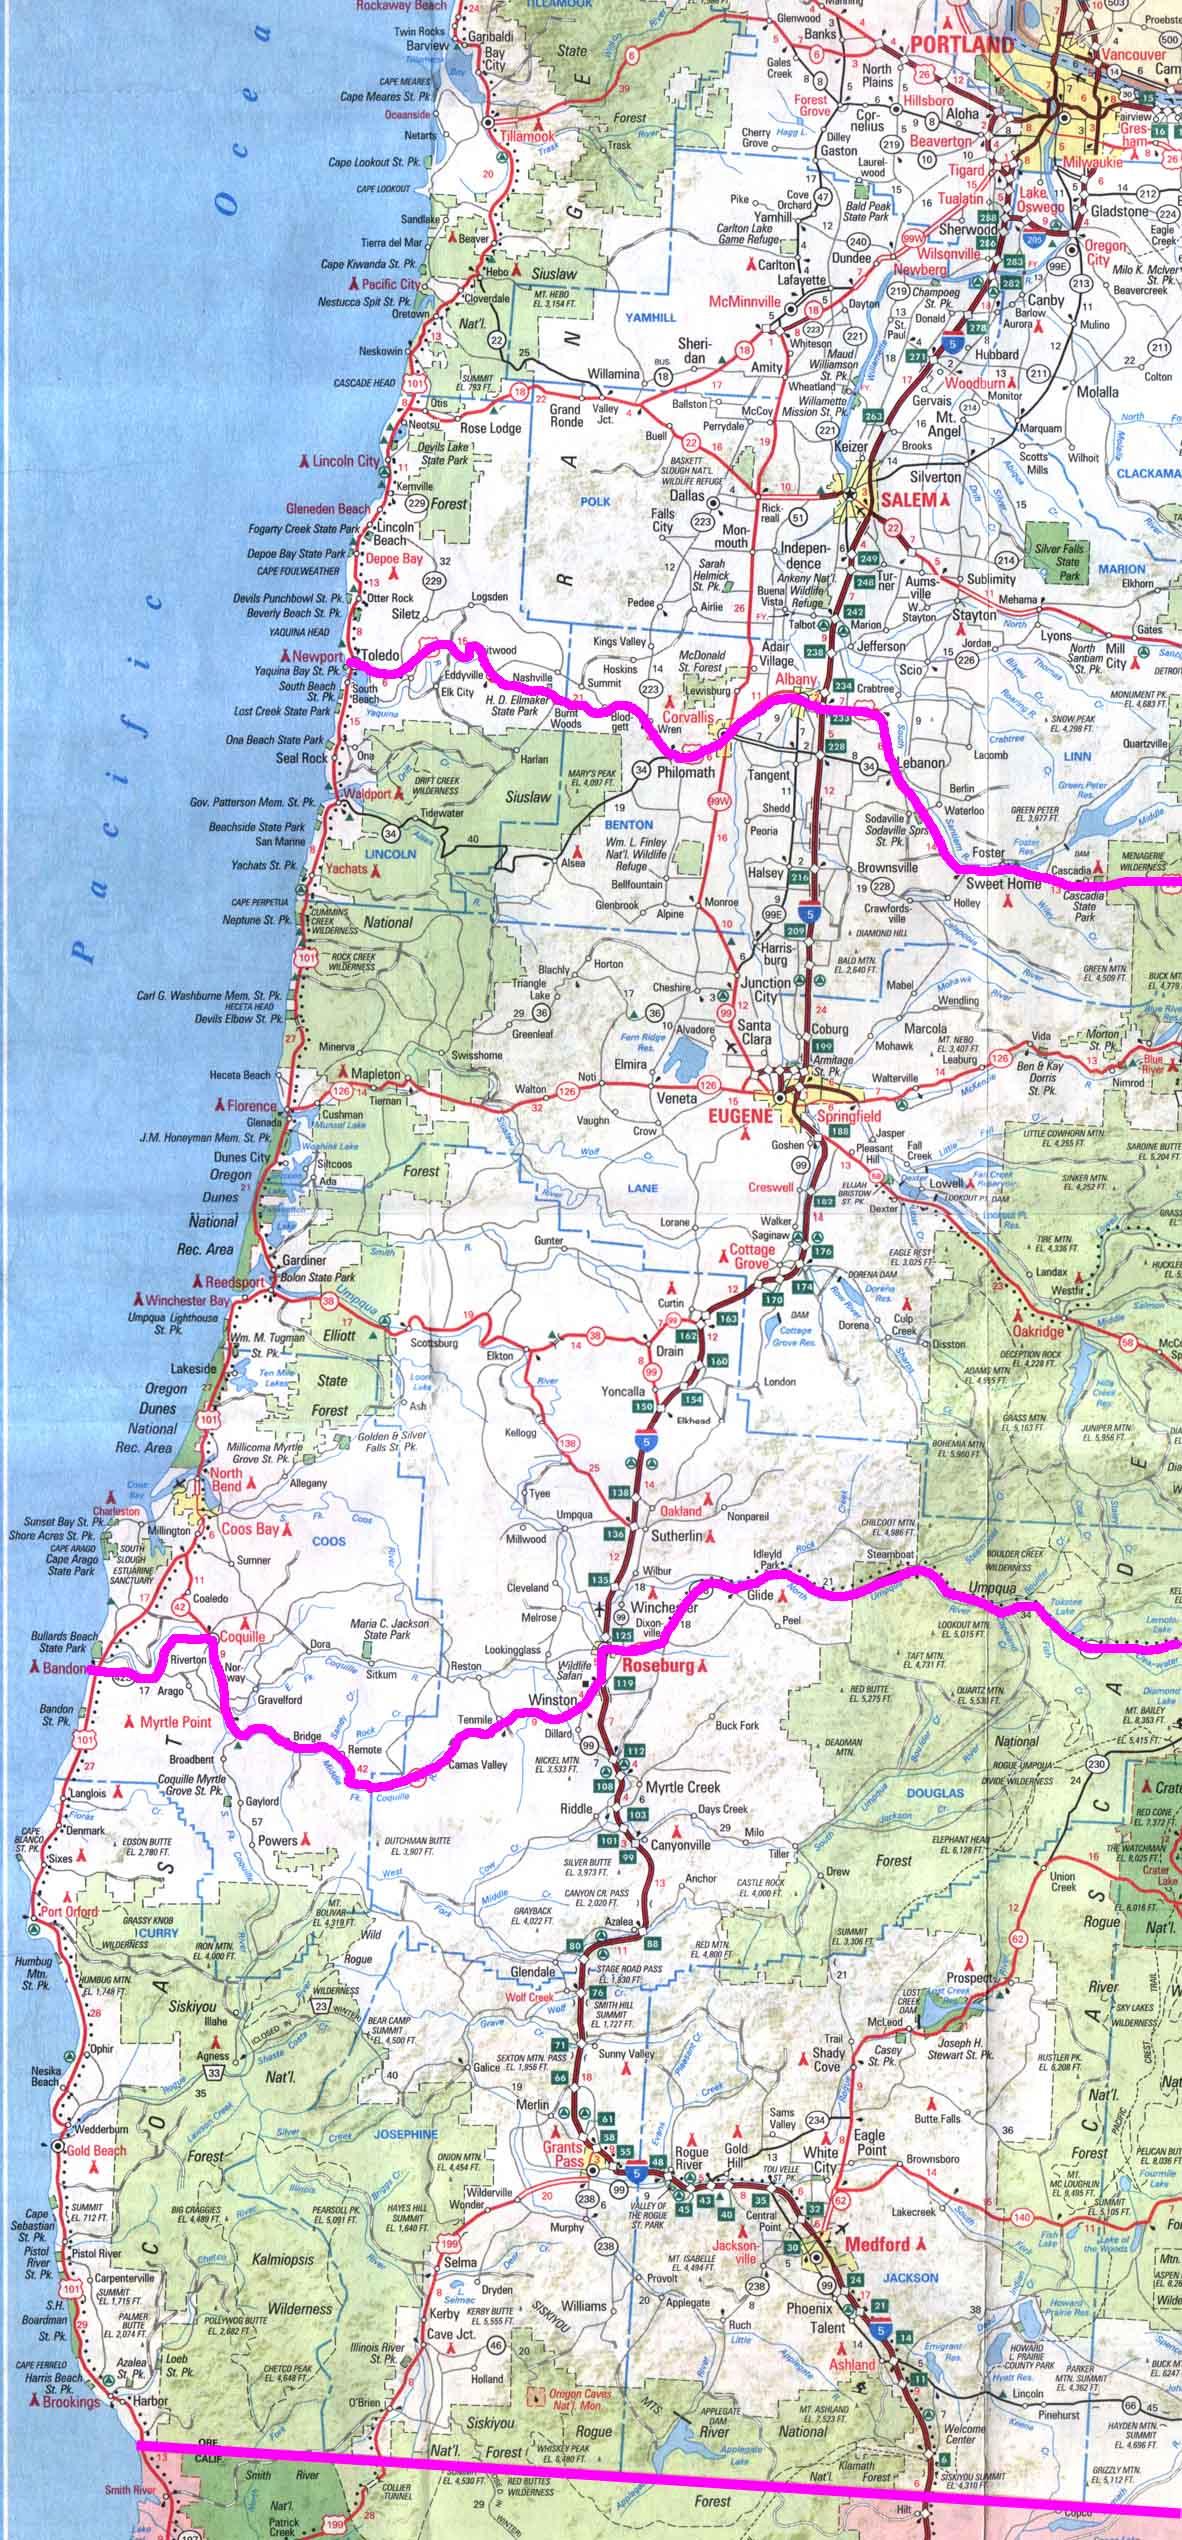 California Oregon Map California Road Map Map Of Oregon And - Road Map Oregon California